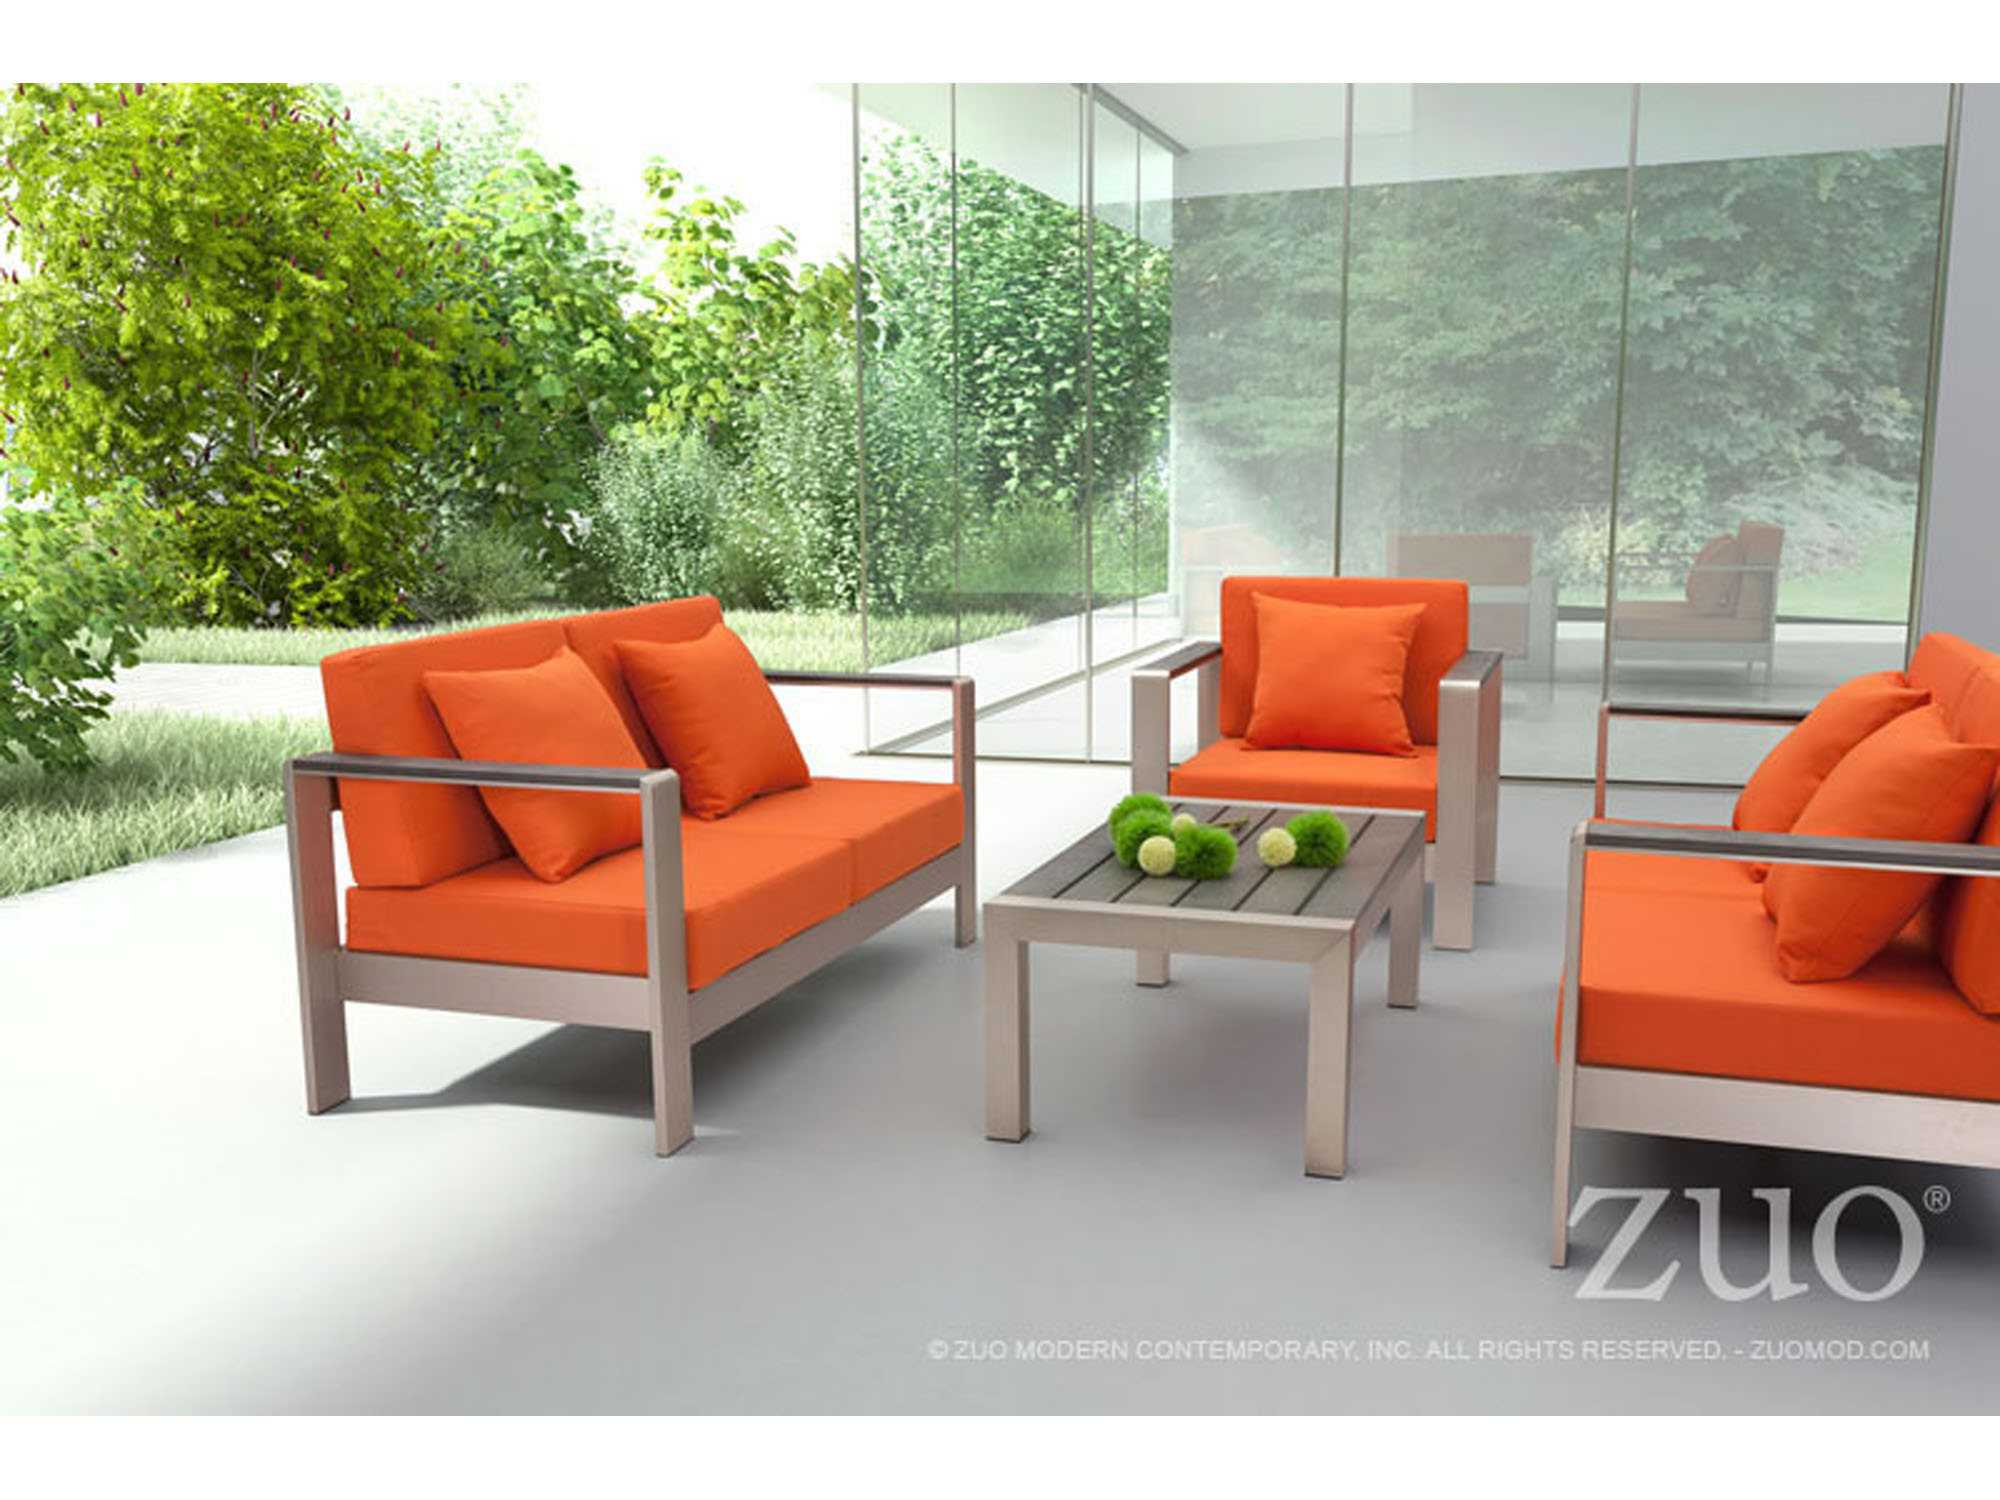 Zuo Outdoor Cosmopolitan Aluminum Conversation Lounge Set